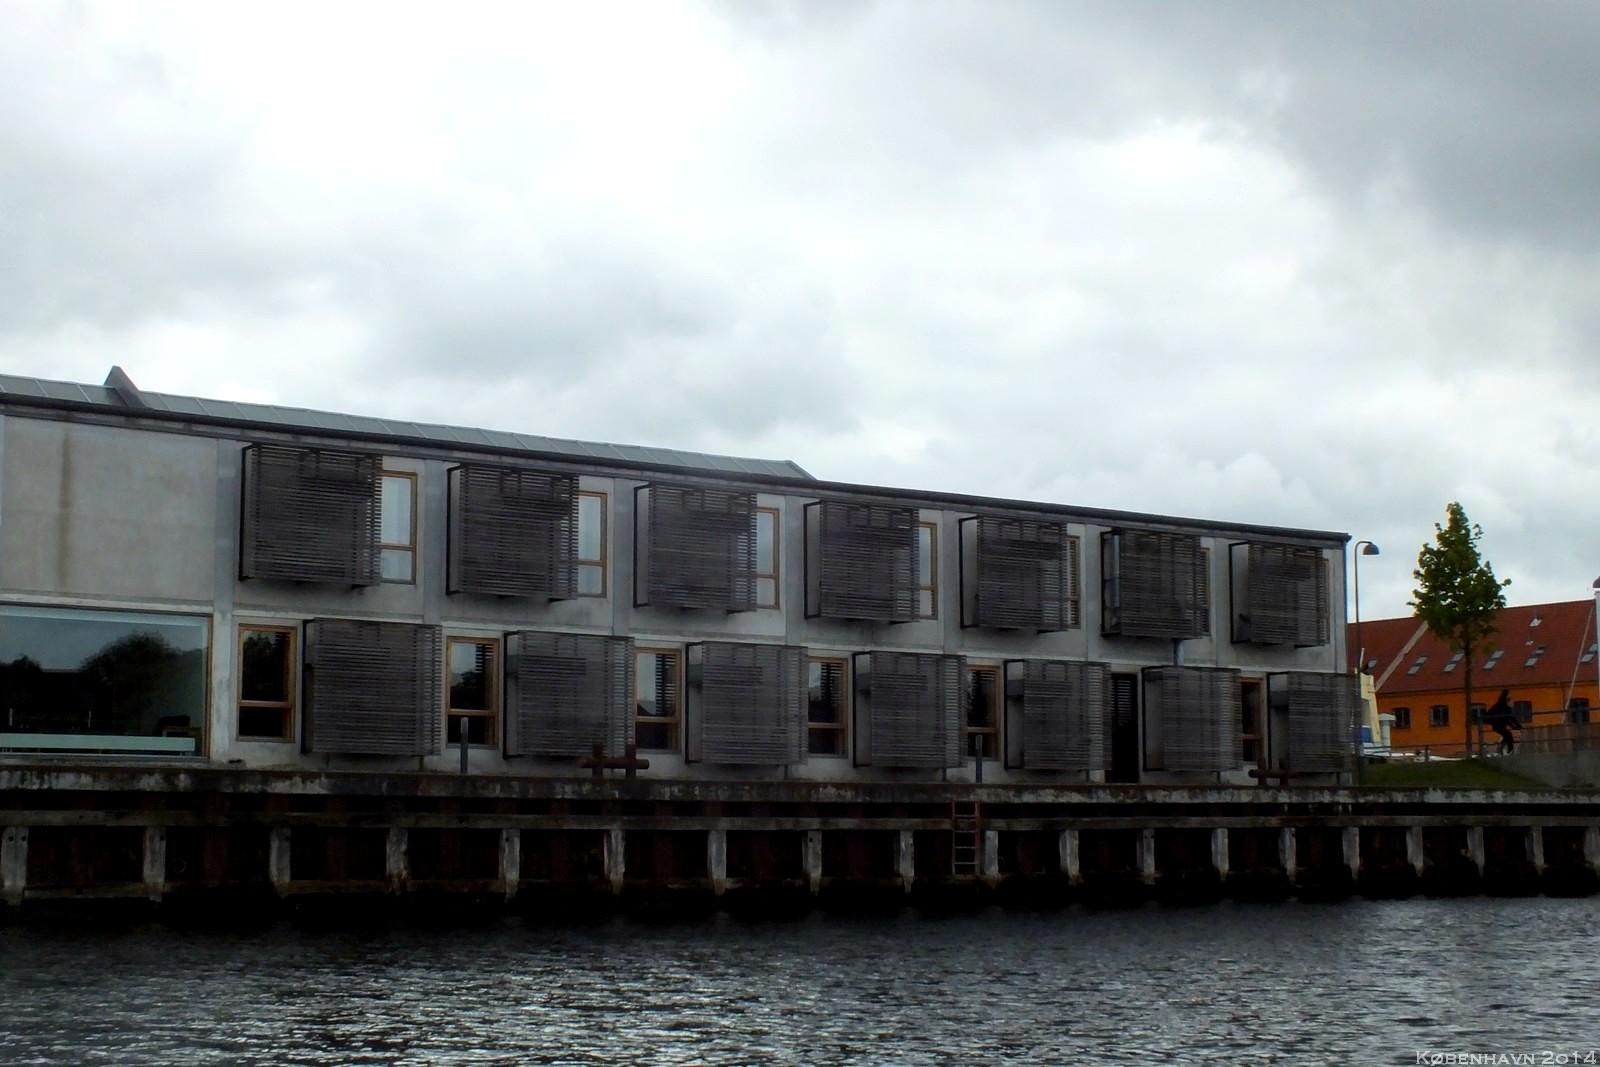 Kanonbådsvej, København, Denmark